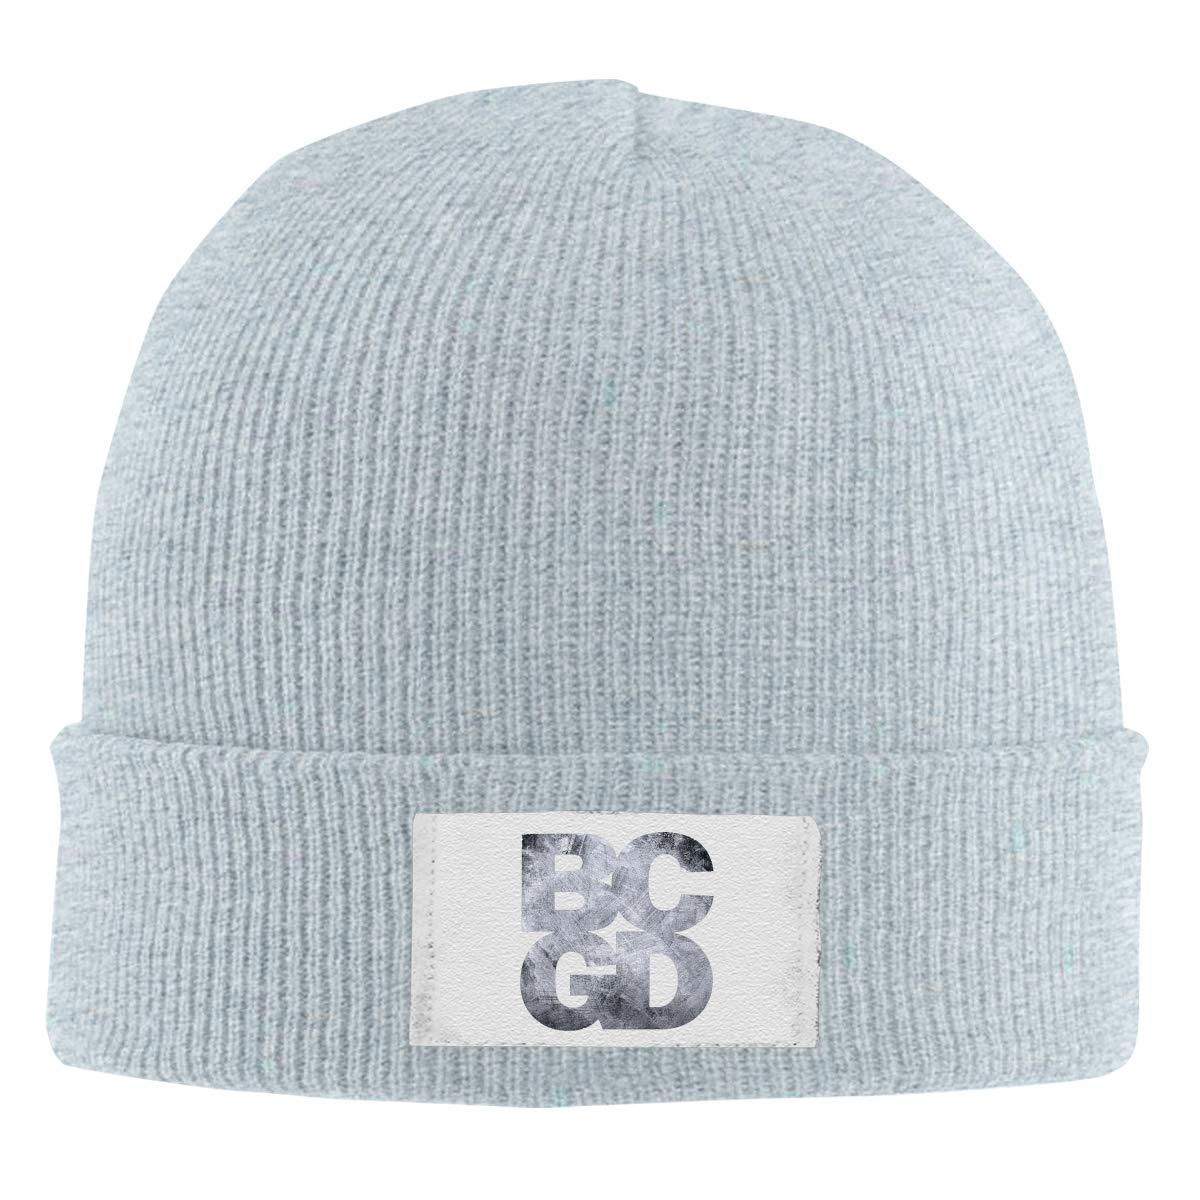 Stretchy Cuff Beanie Hat Black Dunpaiaa Skull Caps BCGD Winter Warm Knit Hats